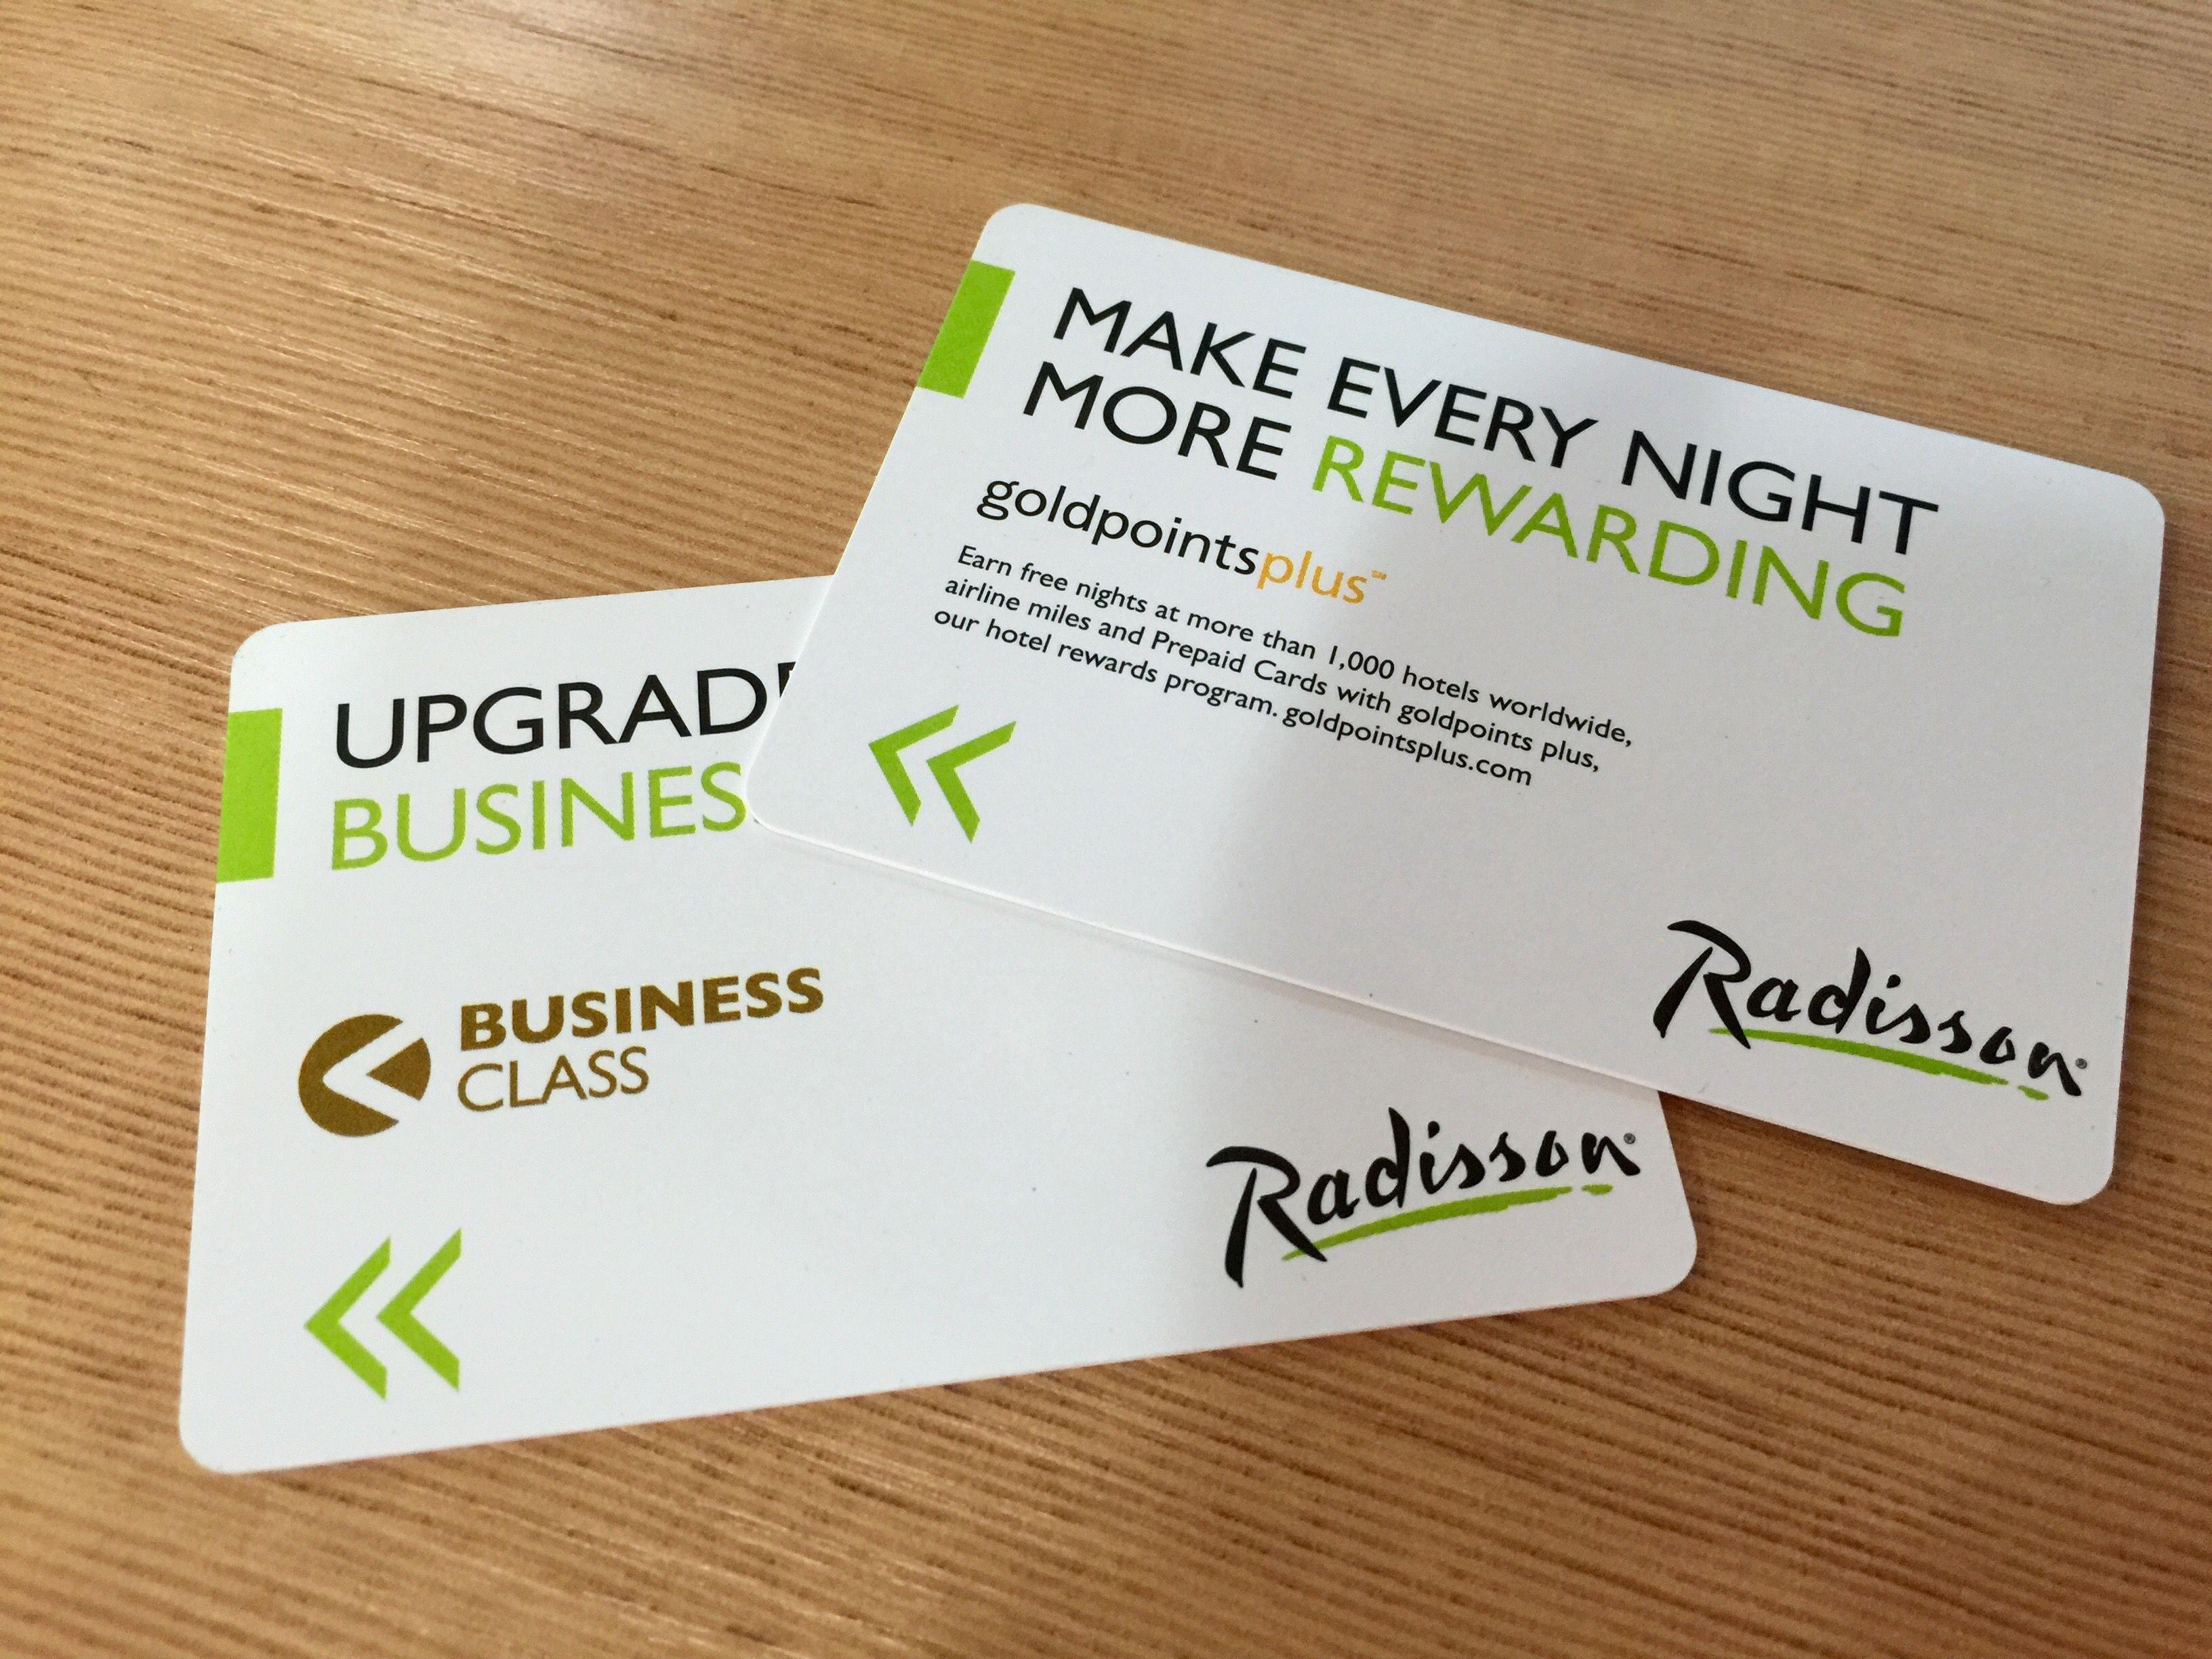 Cards Made For Radisson 3 Hotel Rewards Programs Hotel Rewards Hotel Key Cards